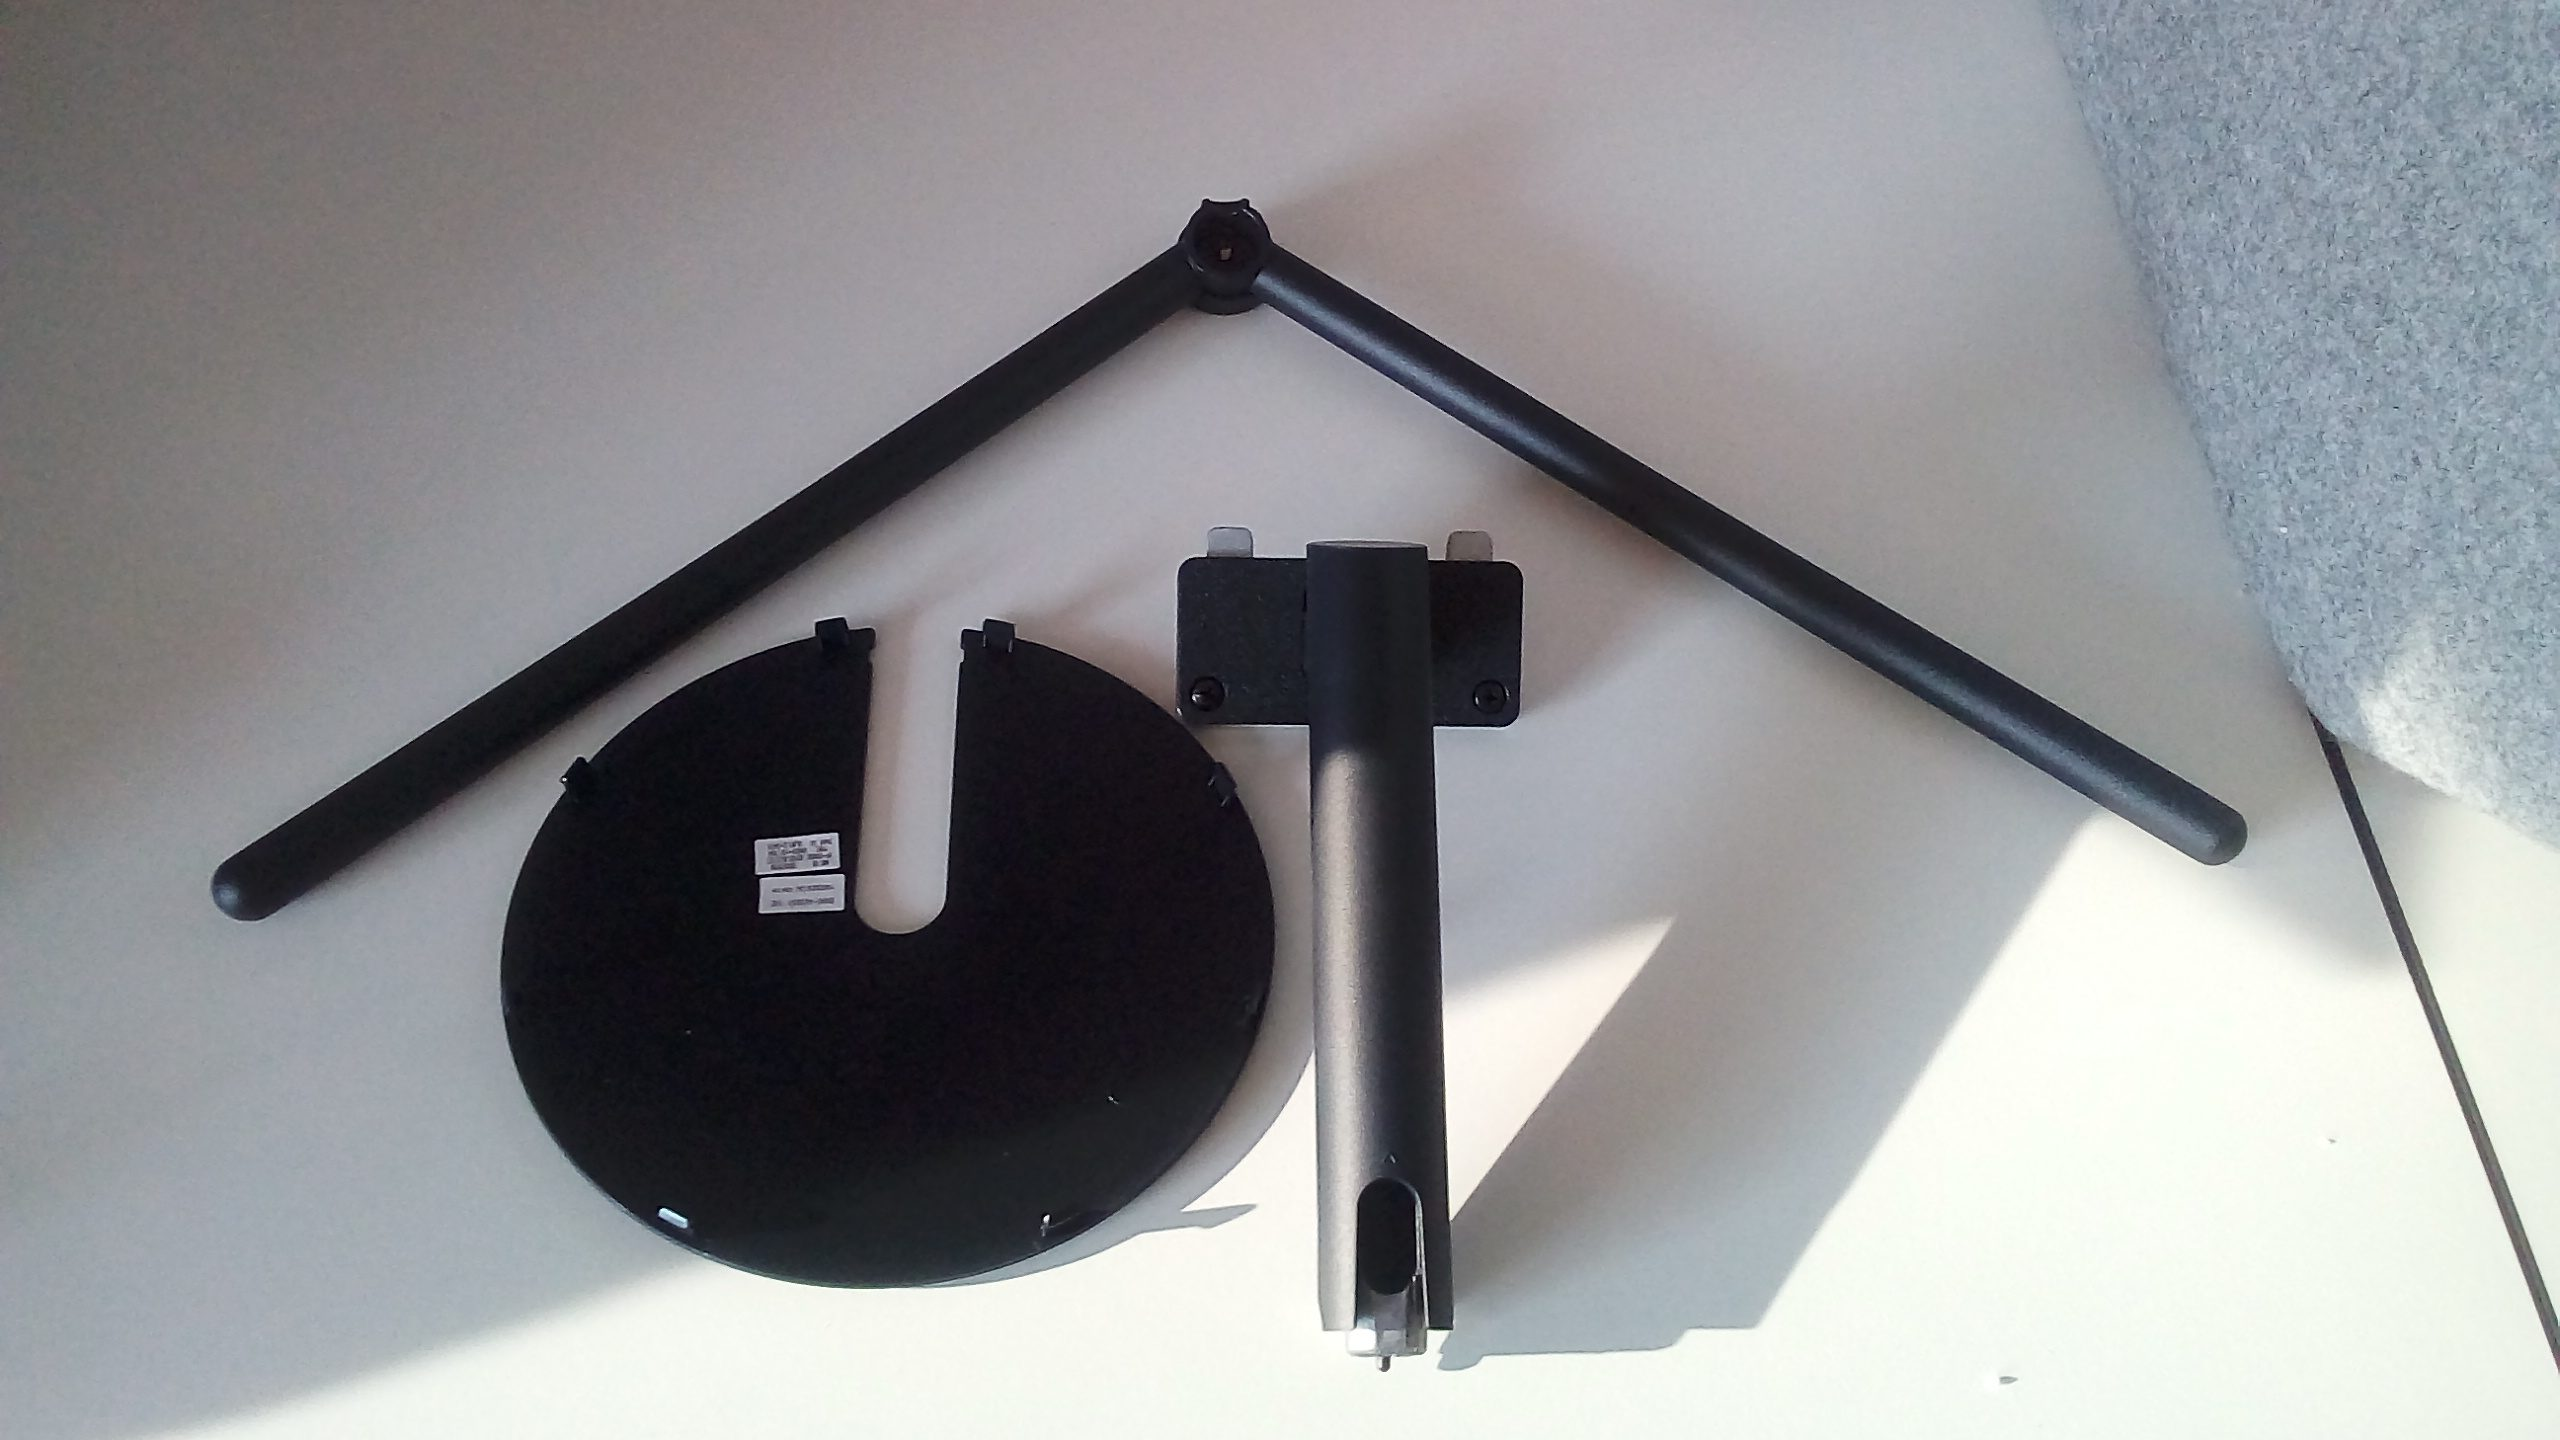 samsung curved 4k podstawka stojak